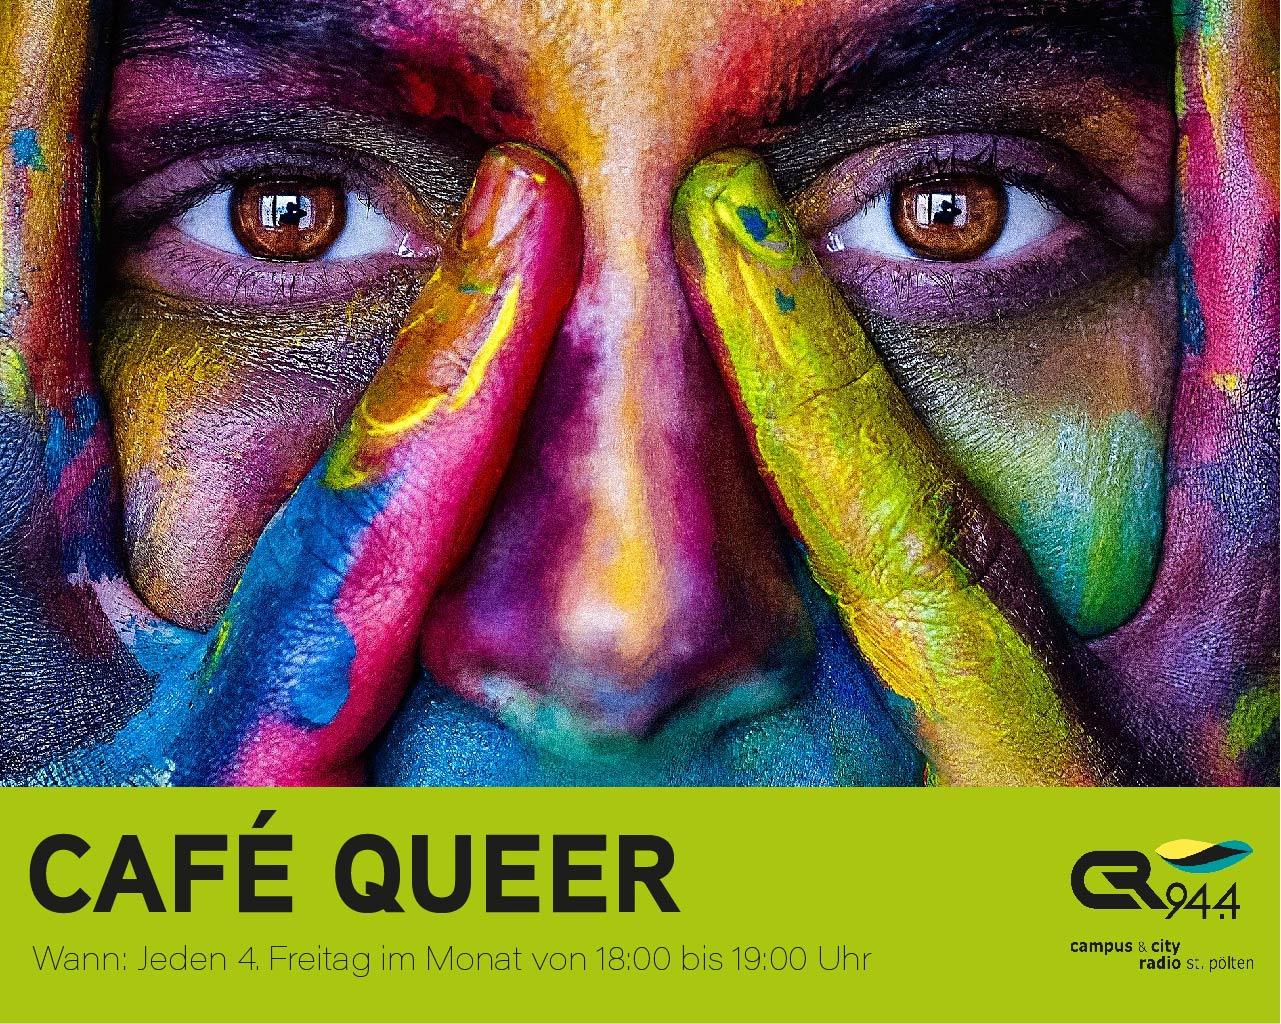 Cafe Queer mit Massud Rahnama und Bakri Hallak, Freitag, 26.6., 18 h